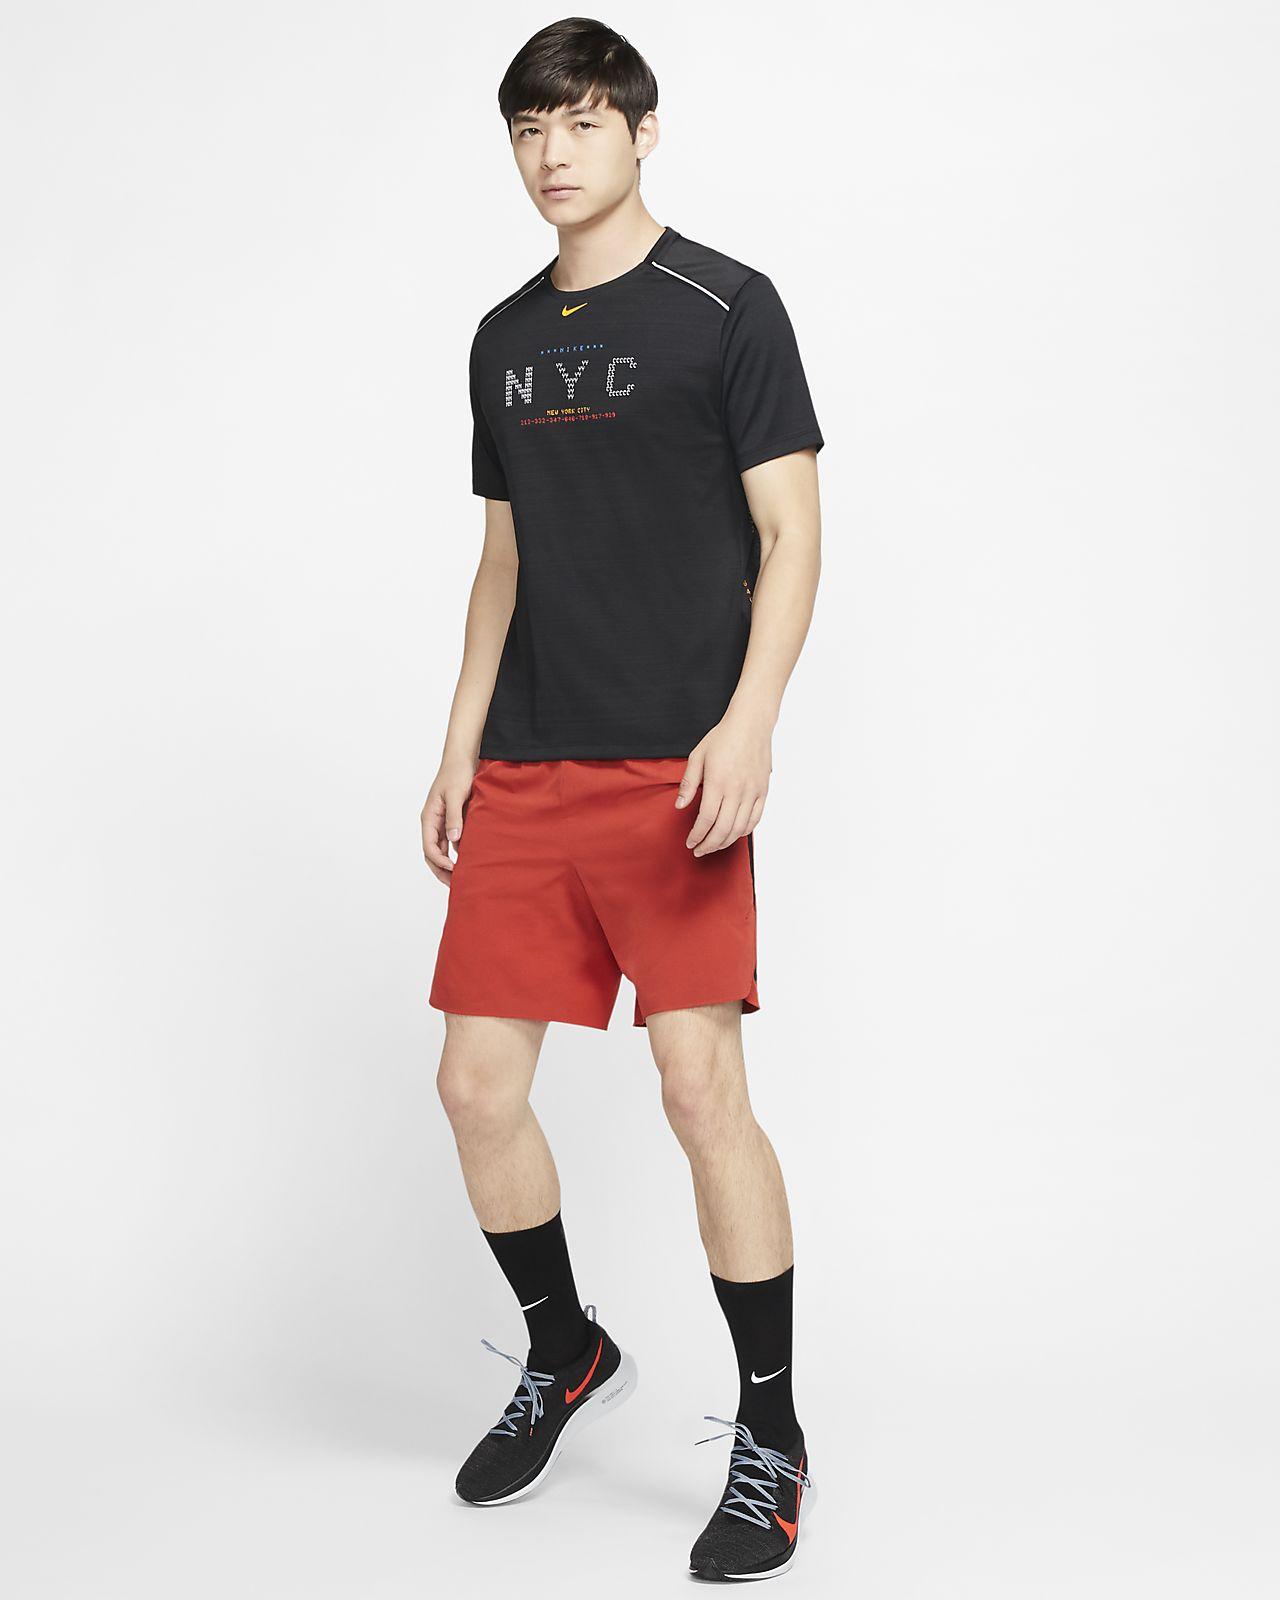 Kortärmad löpartröja Nike Dri-FIT Miler NYC för män